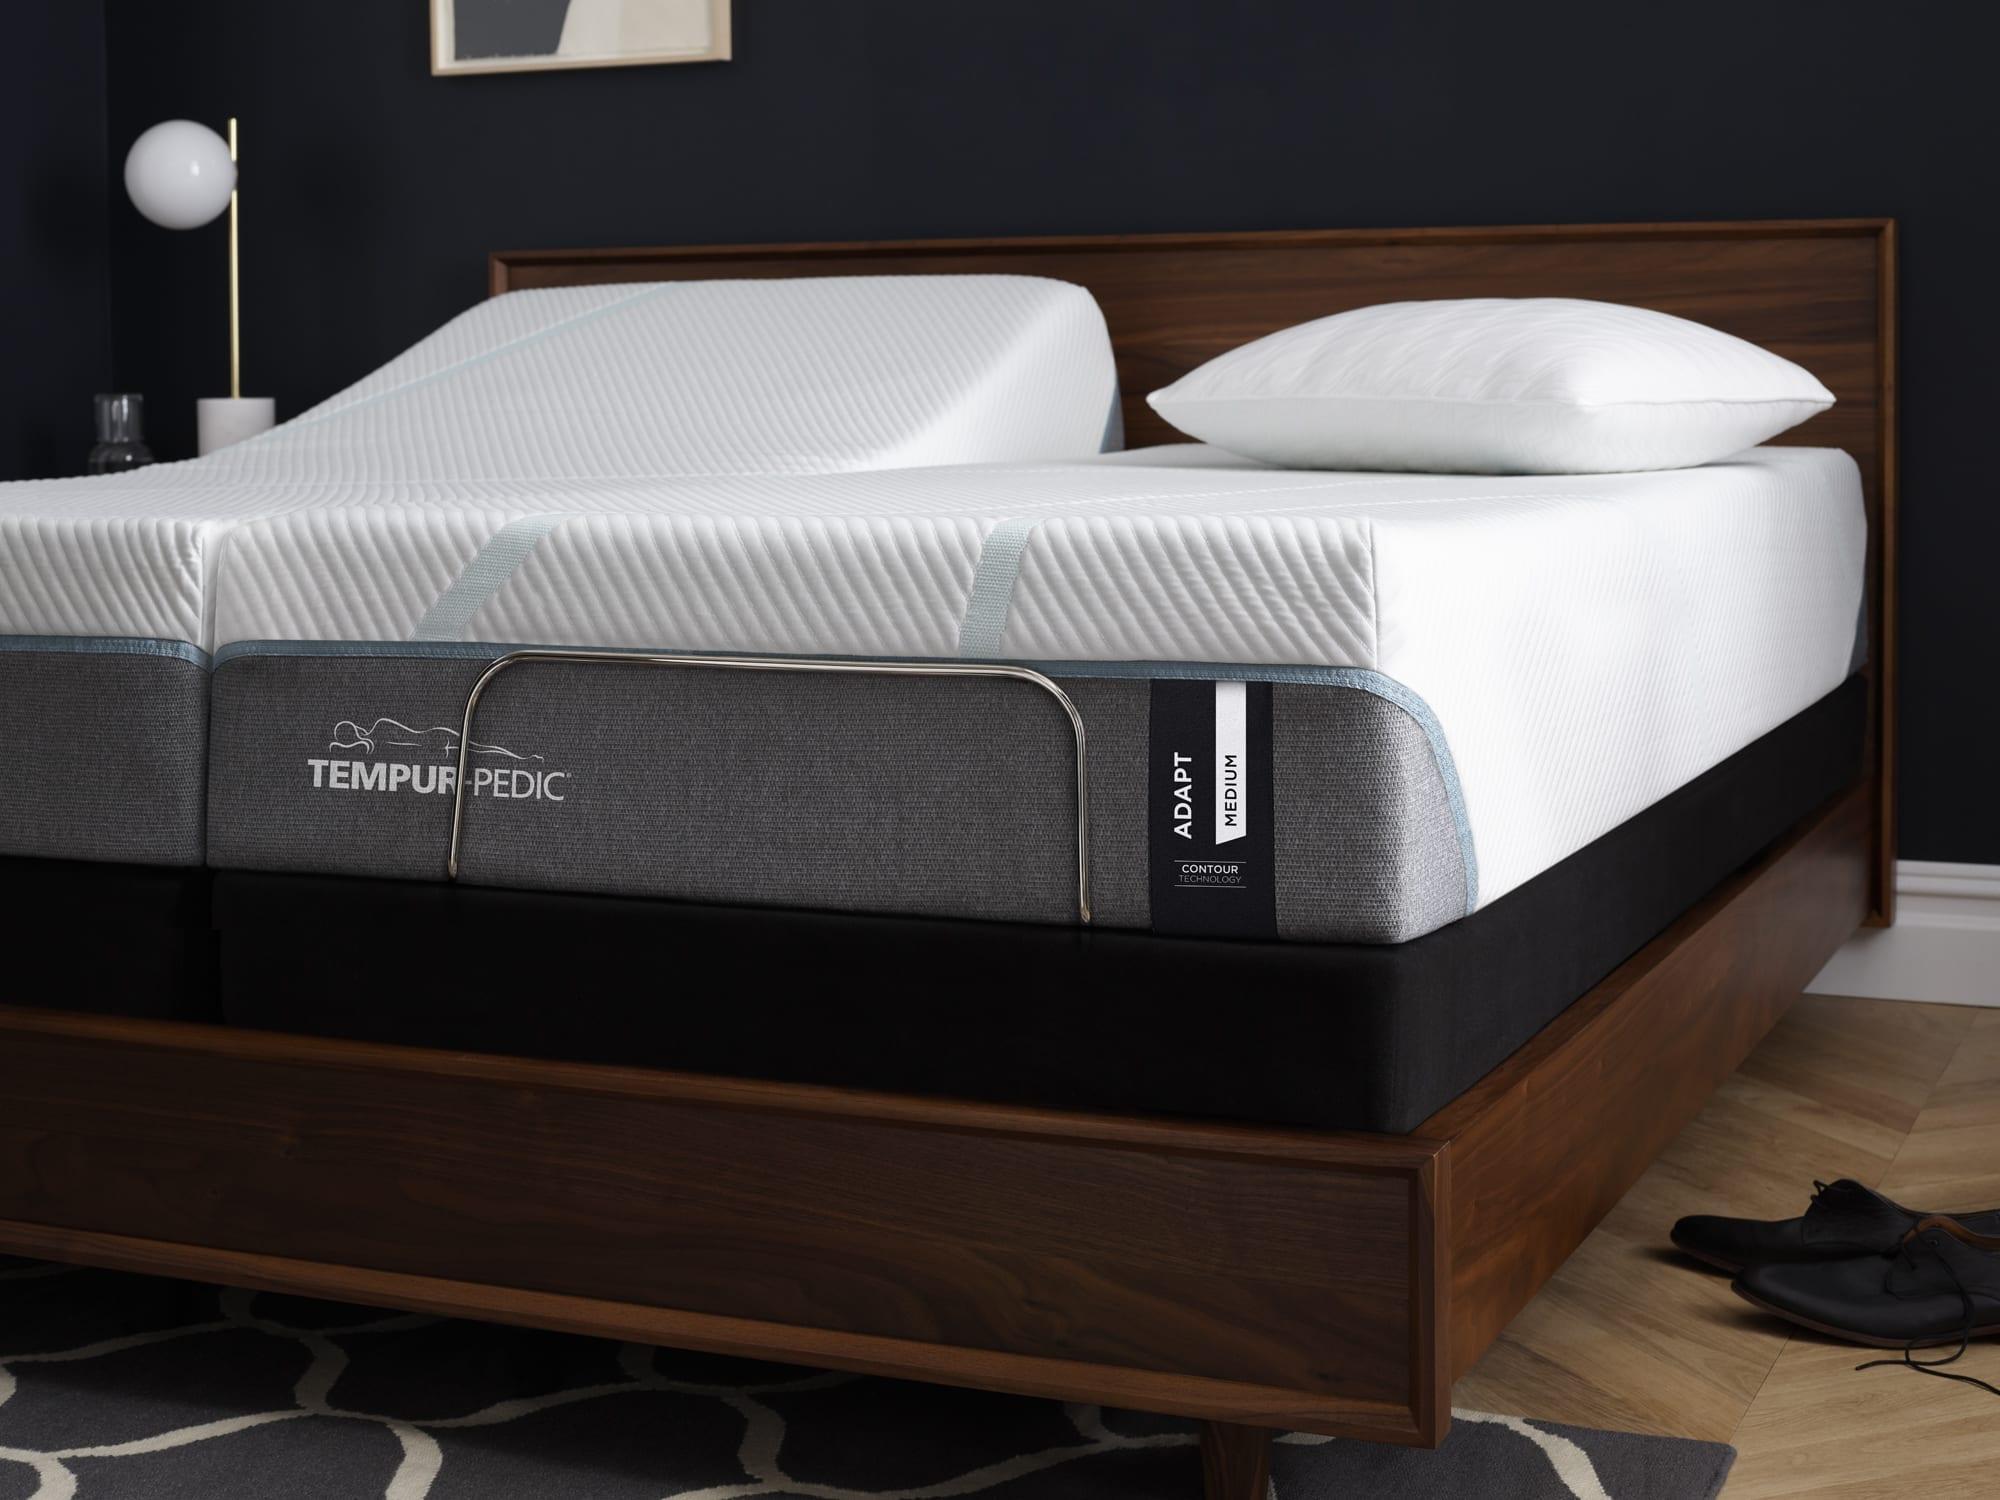 Tempur-Adapt mattress available at Best Mattress in Las Vegas, Mesquite & St. George, Utah